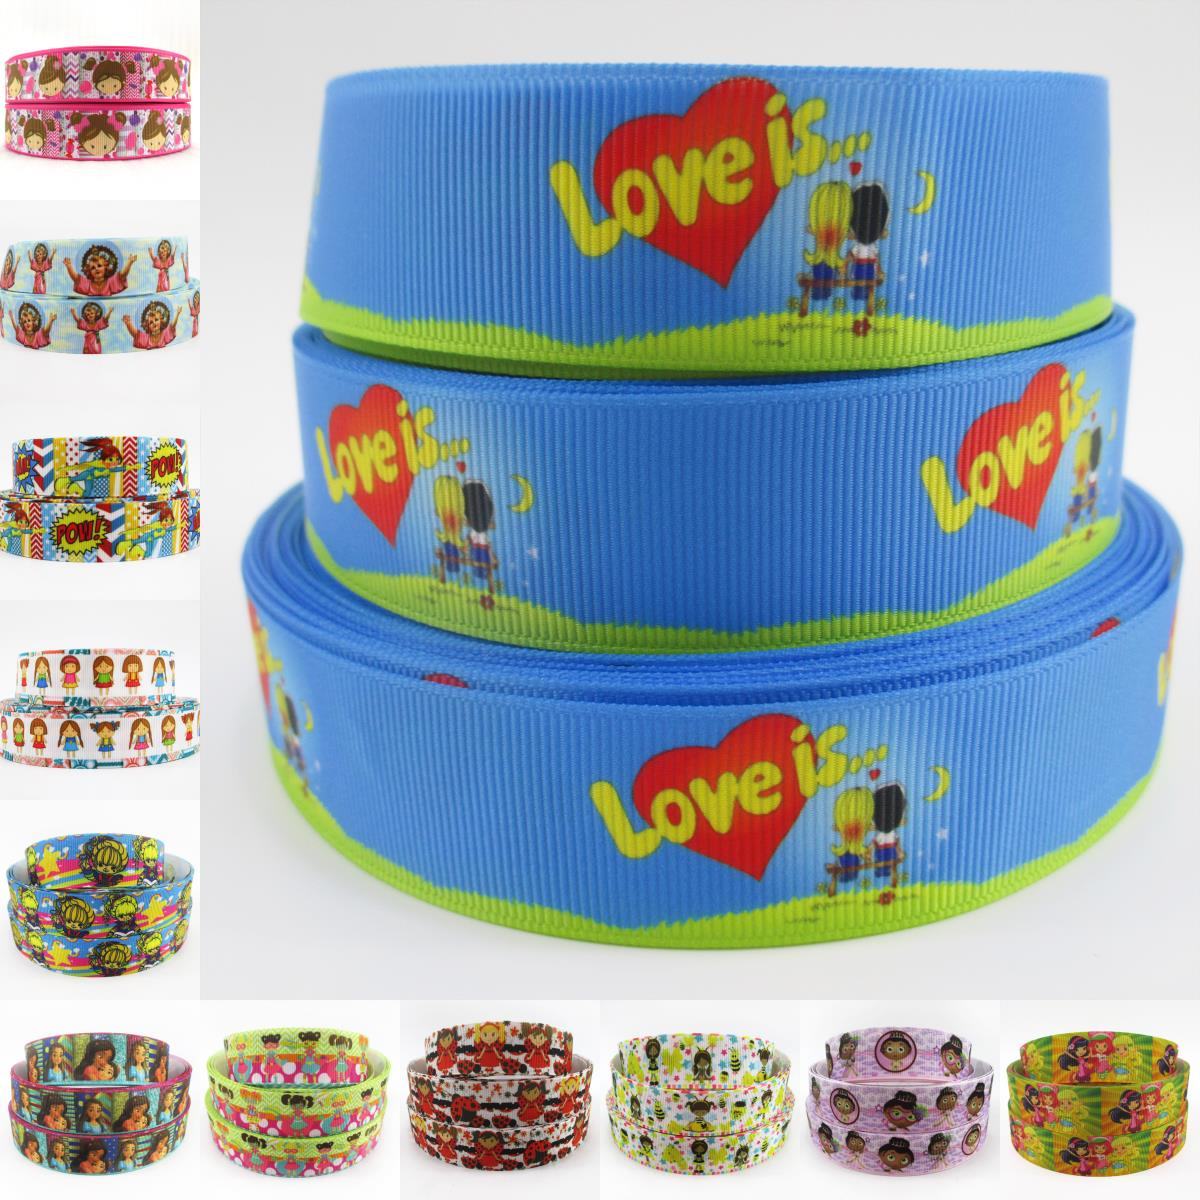 1 25mm boy grils cartoon printed polyester ribbon 50 yards, DIY handmade materials, wedding gift wrap,50Yc1601